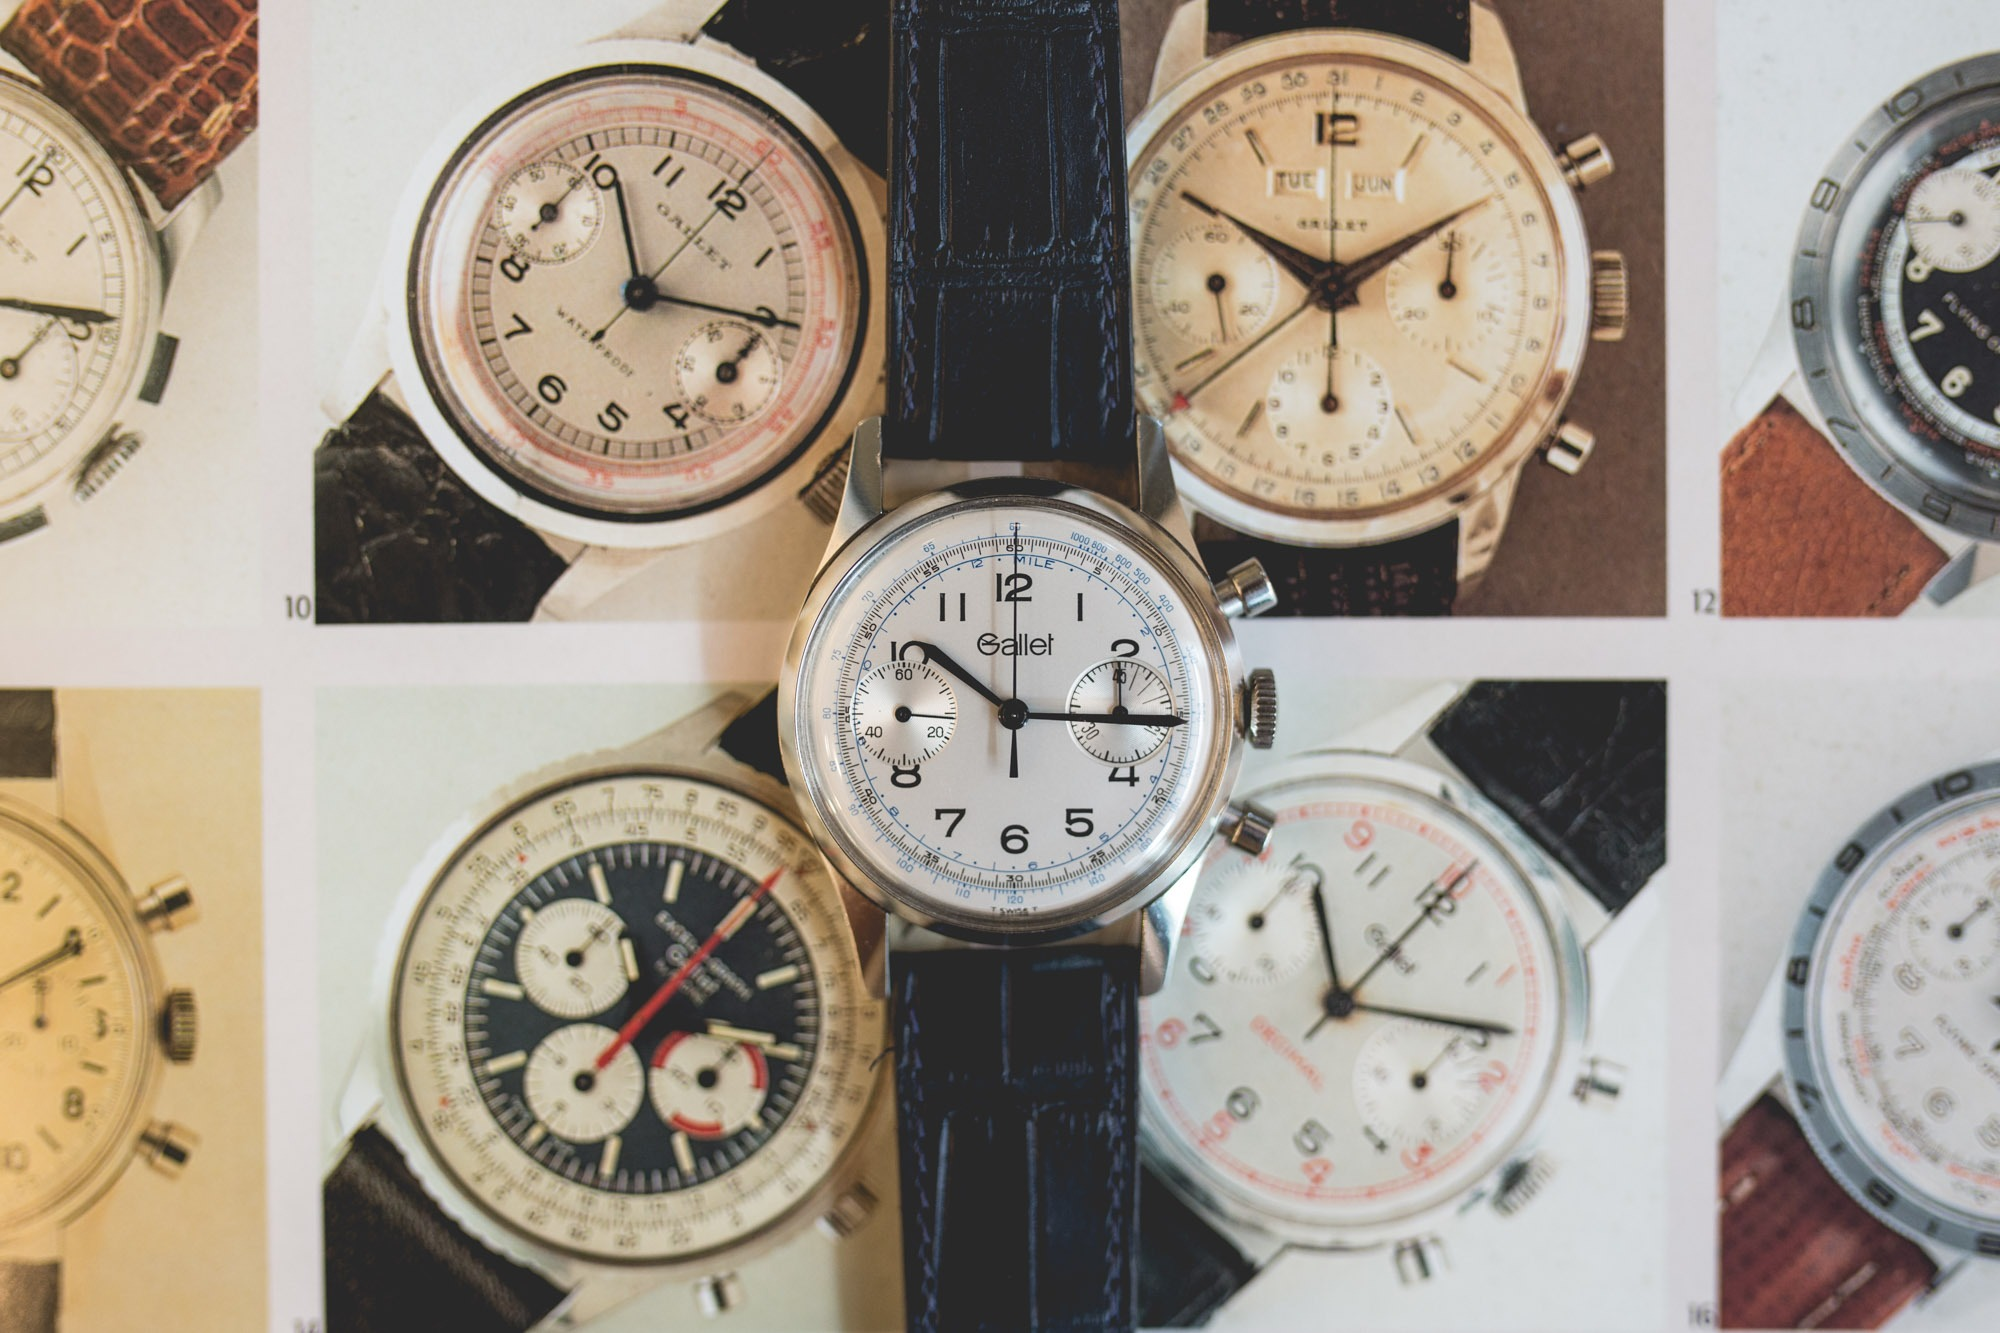 Gallet - Vintage Chronograph